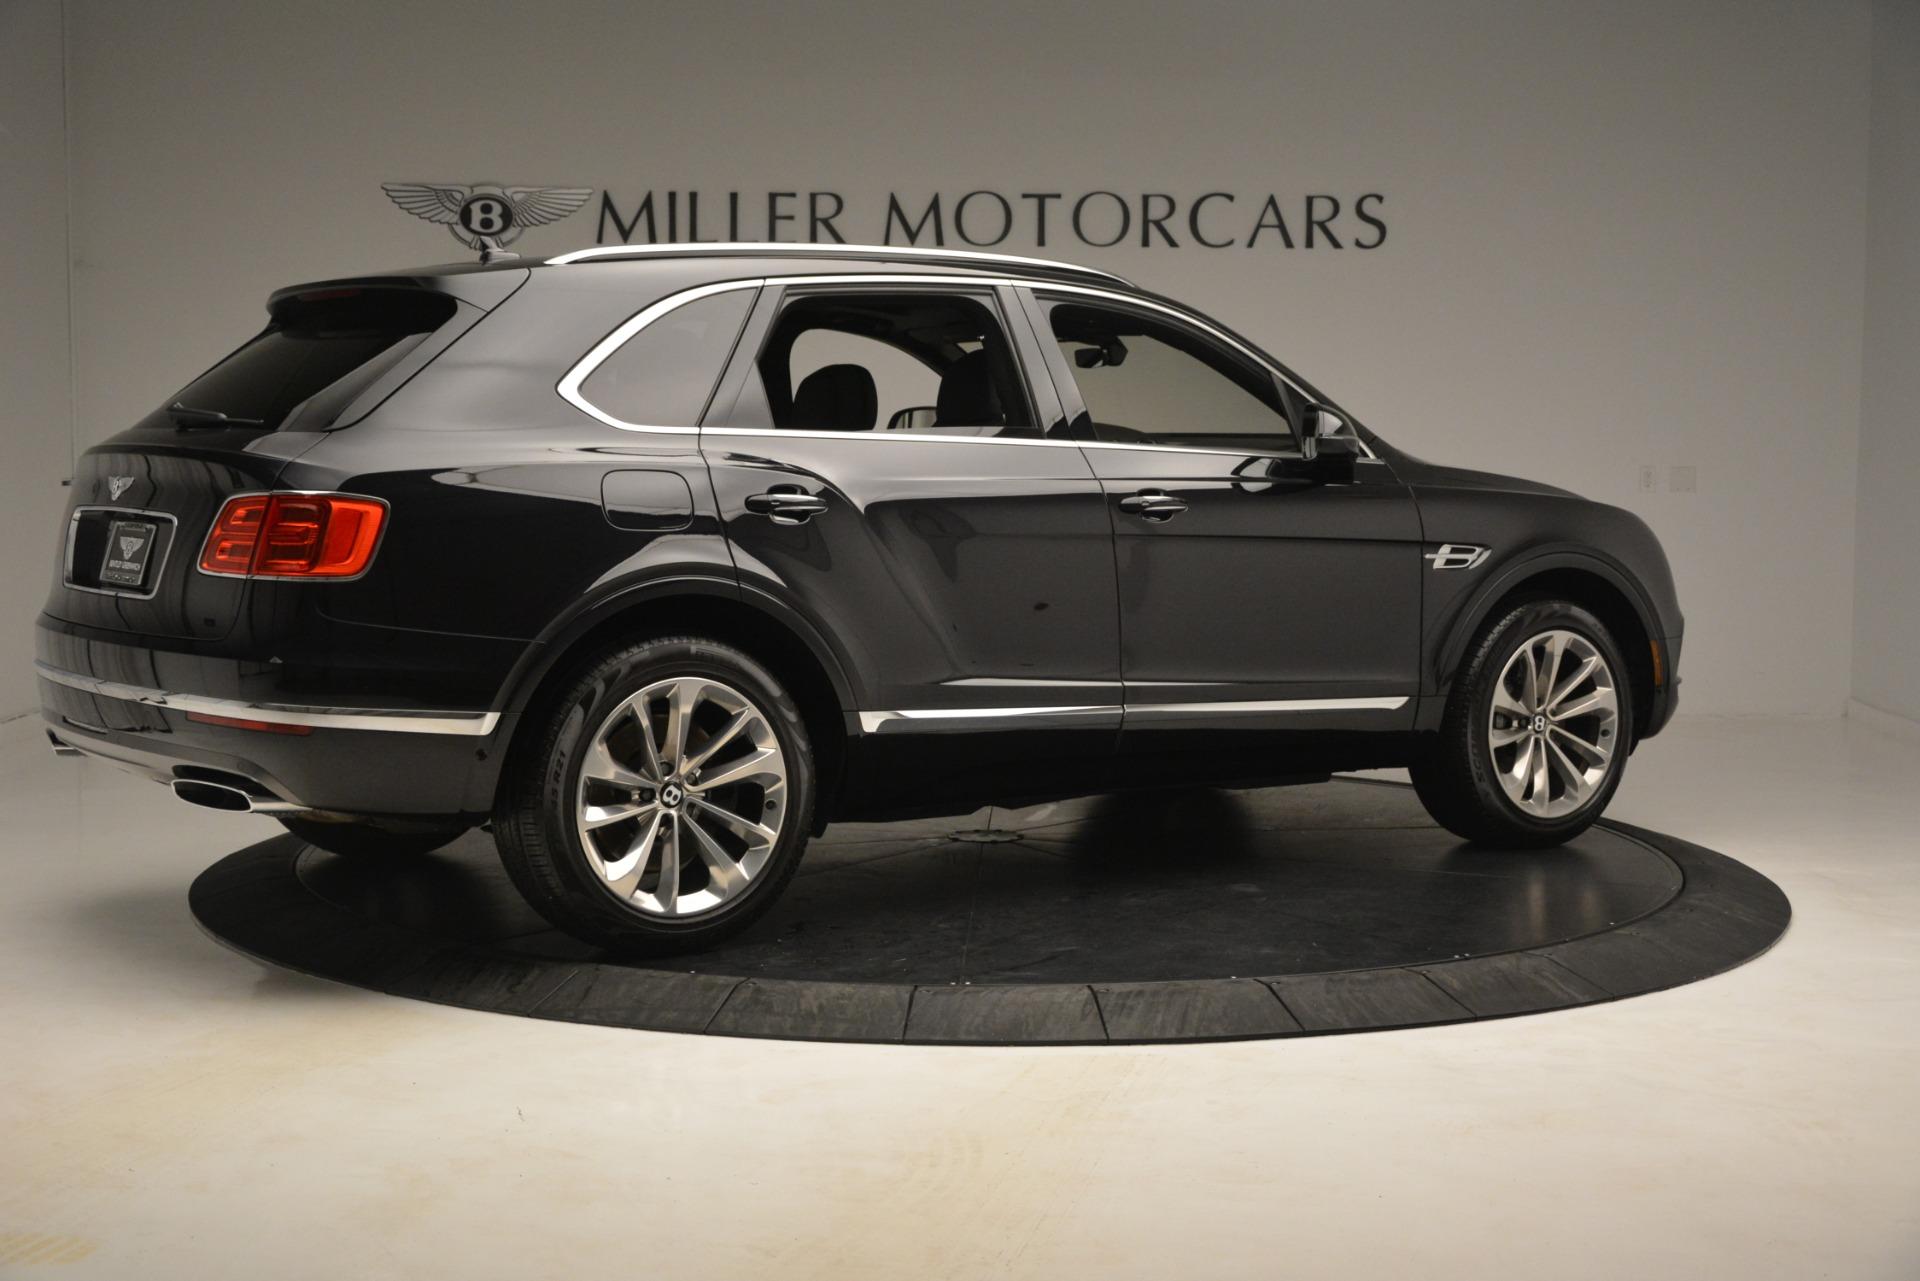 Used 2017 Bentley Bentayga W12 For Sale In Greenwich, CT. Alfa Romeo of Greenwich, 7570 3239_p8